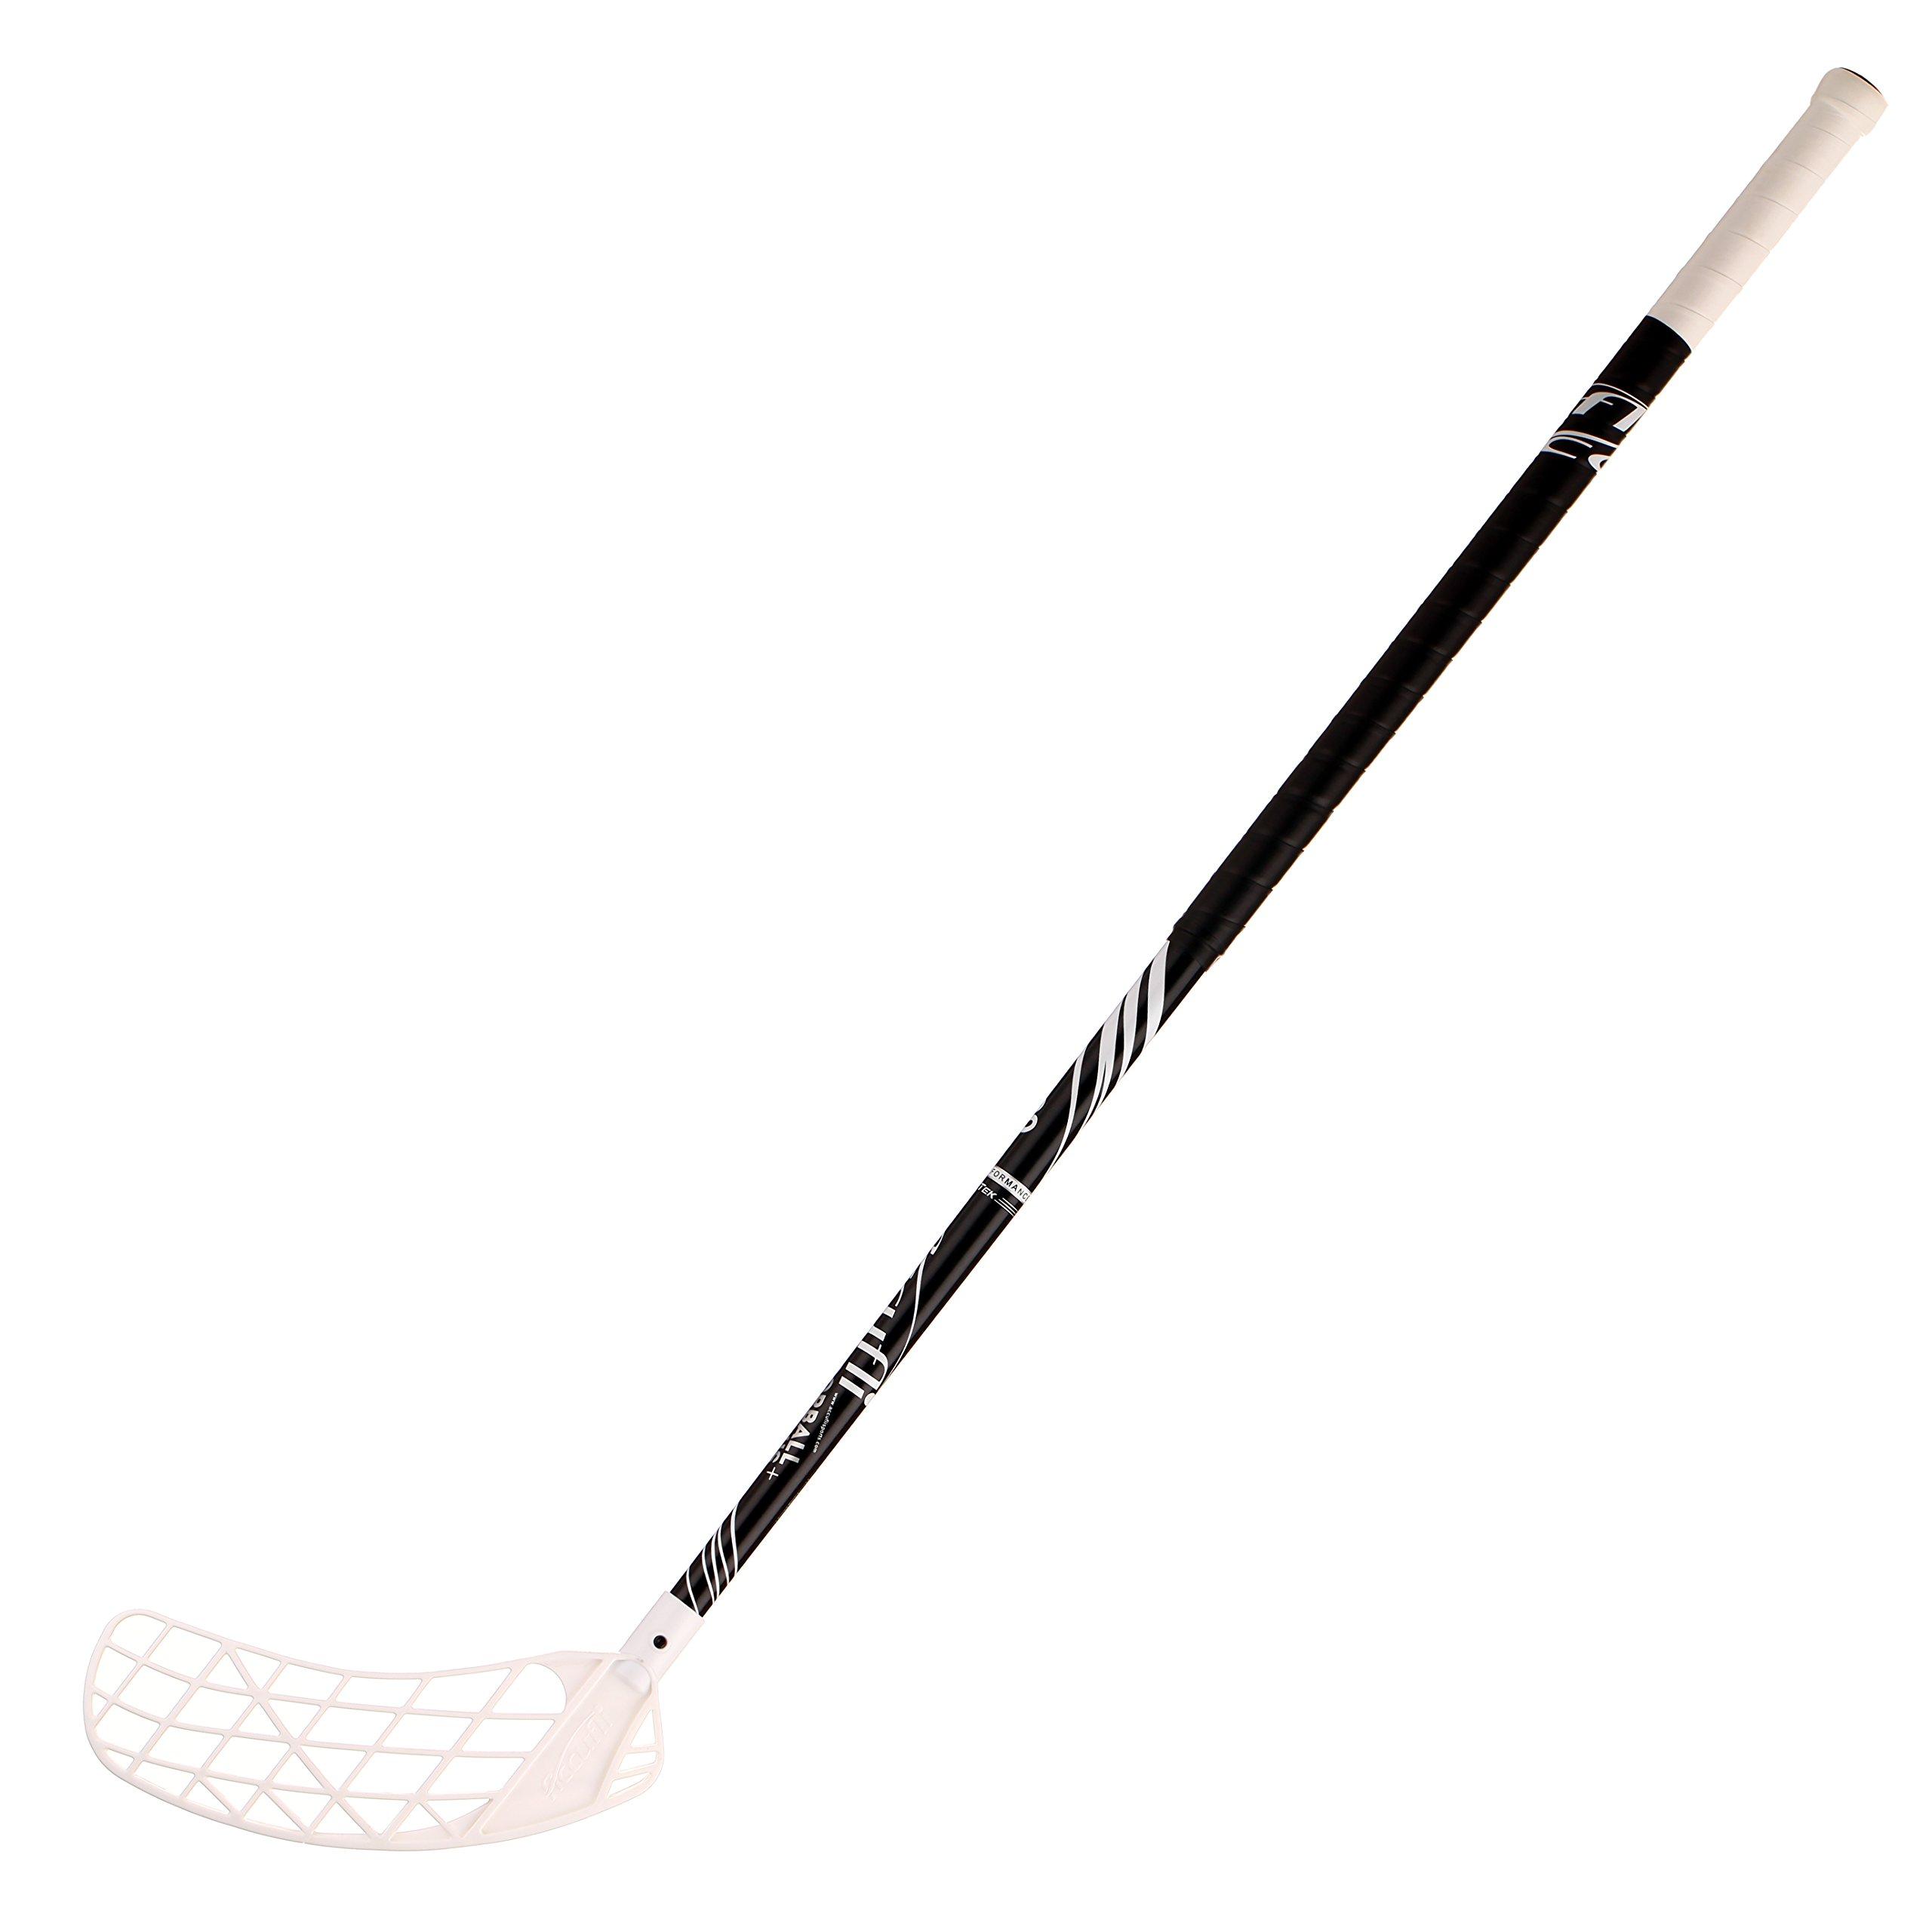 ACCUFLI Floorball Stick AirTek A90 Left 40inch Curved Blade (White)